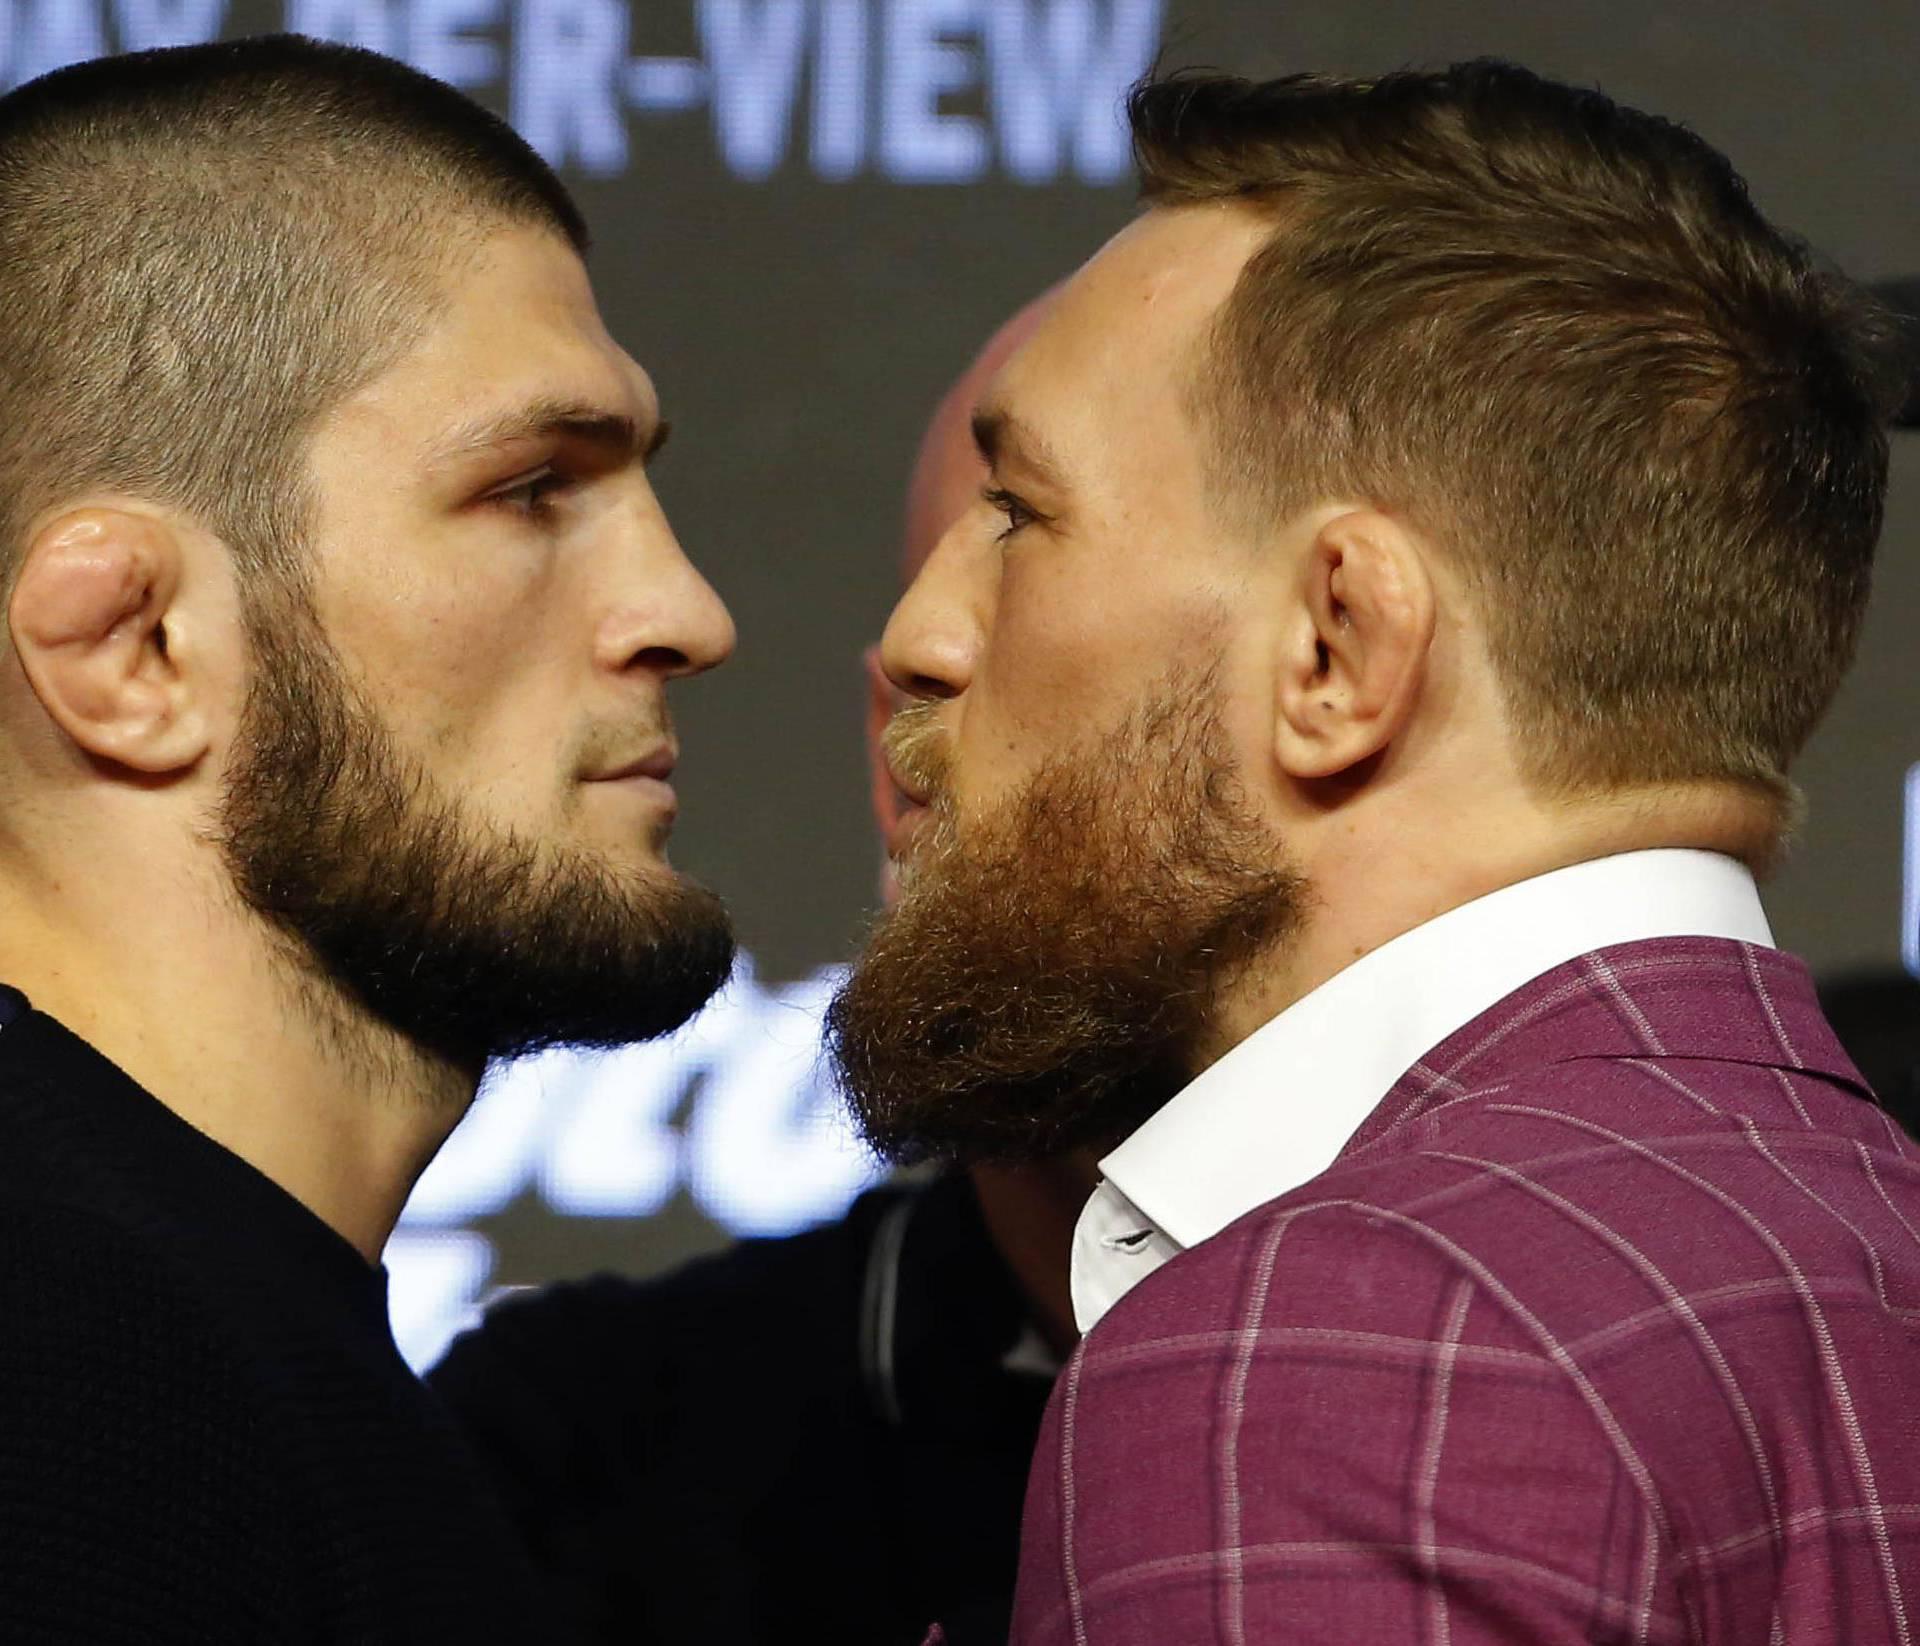 MMA: UFC 229 - Press Conference